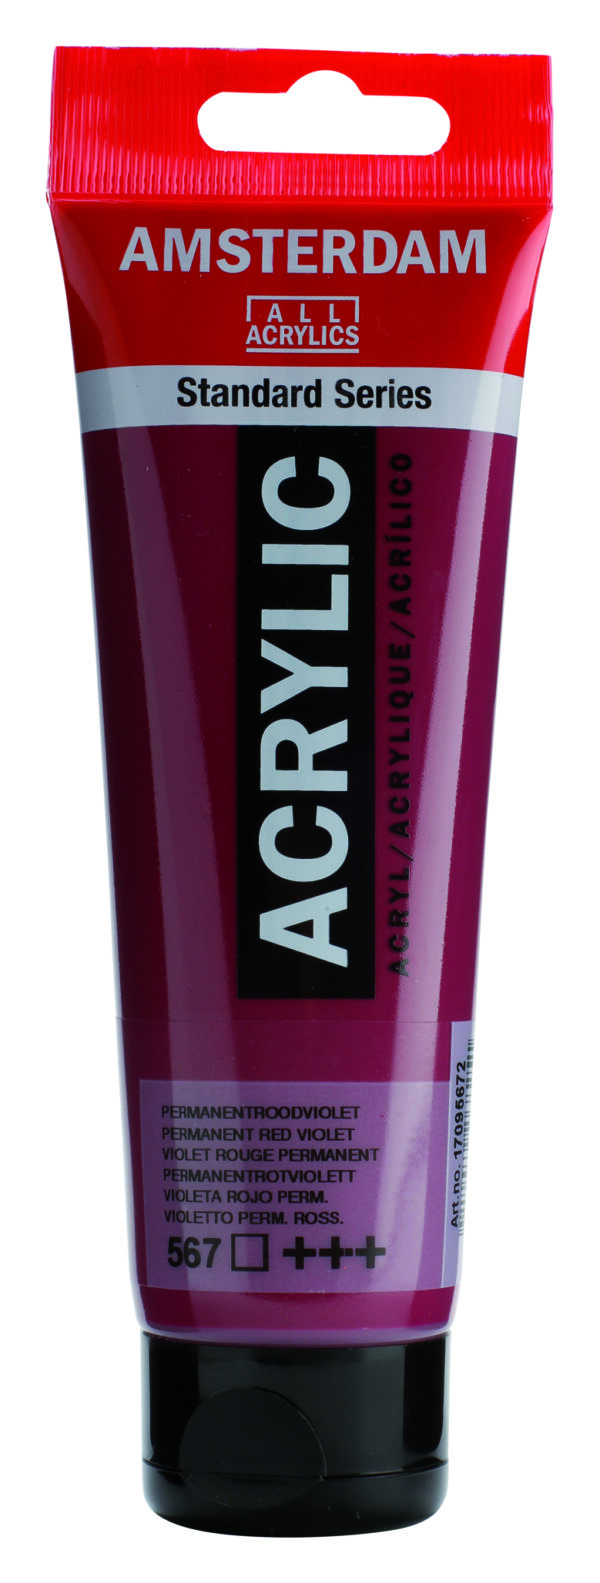 Ams std 567 Permanent red violet - 120 ml